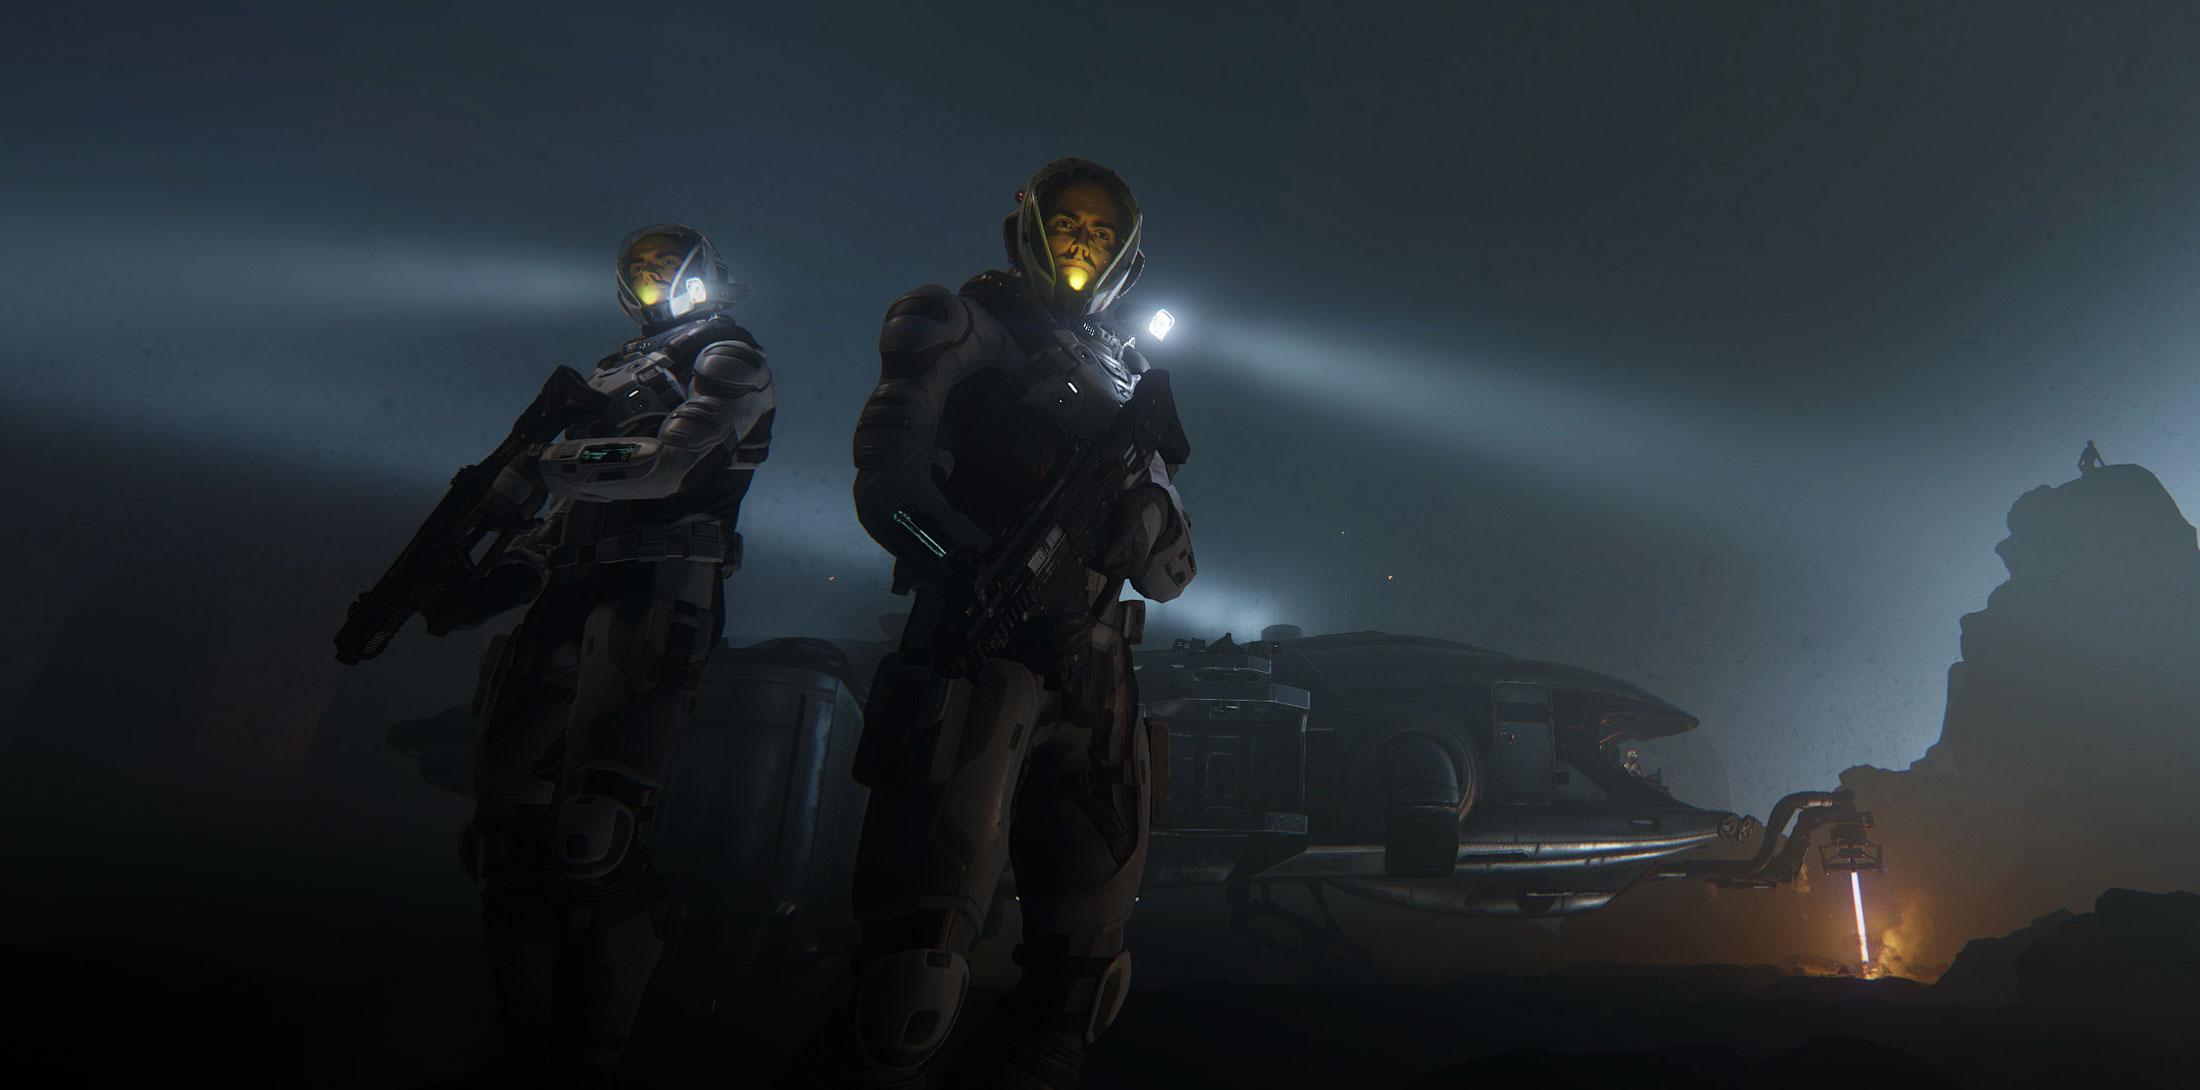 star citizen 3.0 screenshot leaked marines